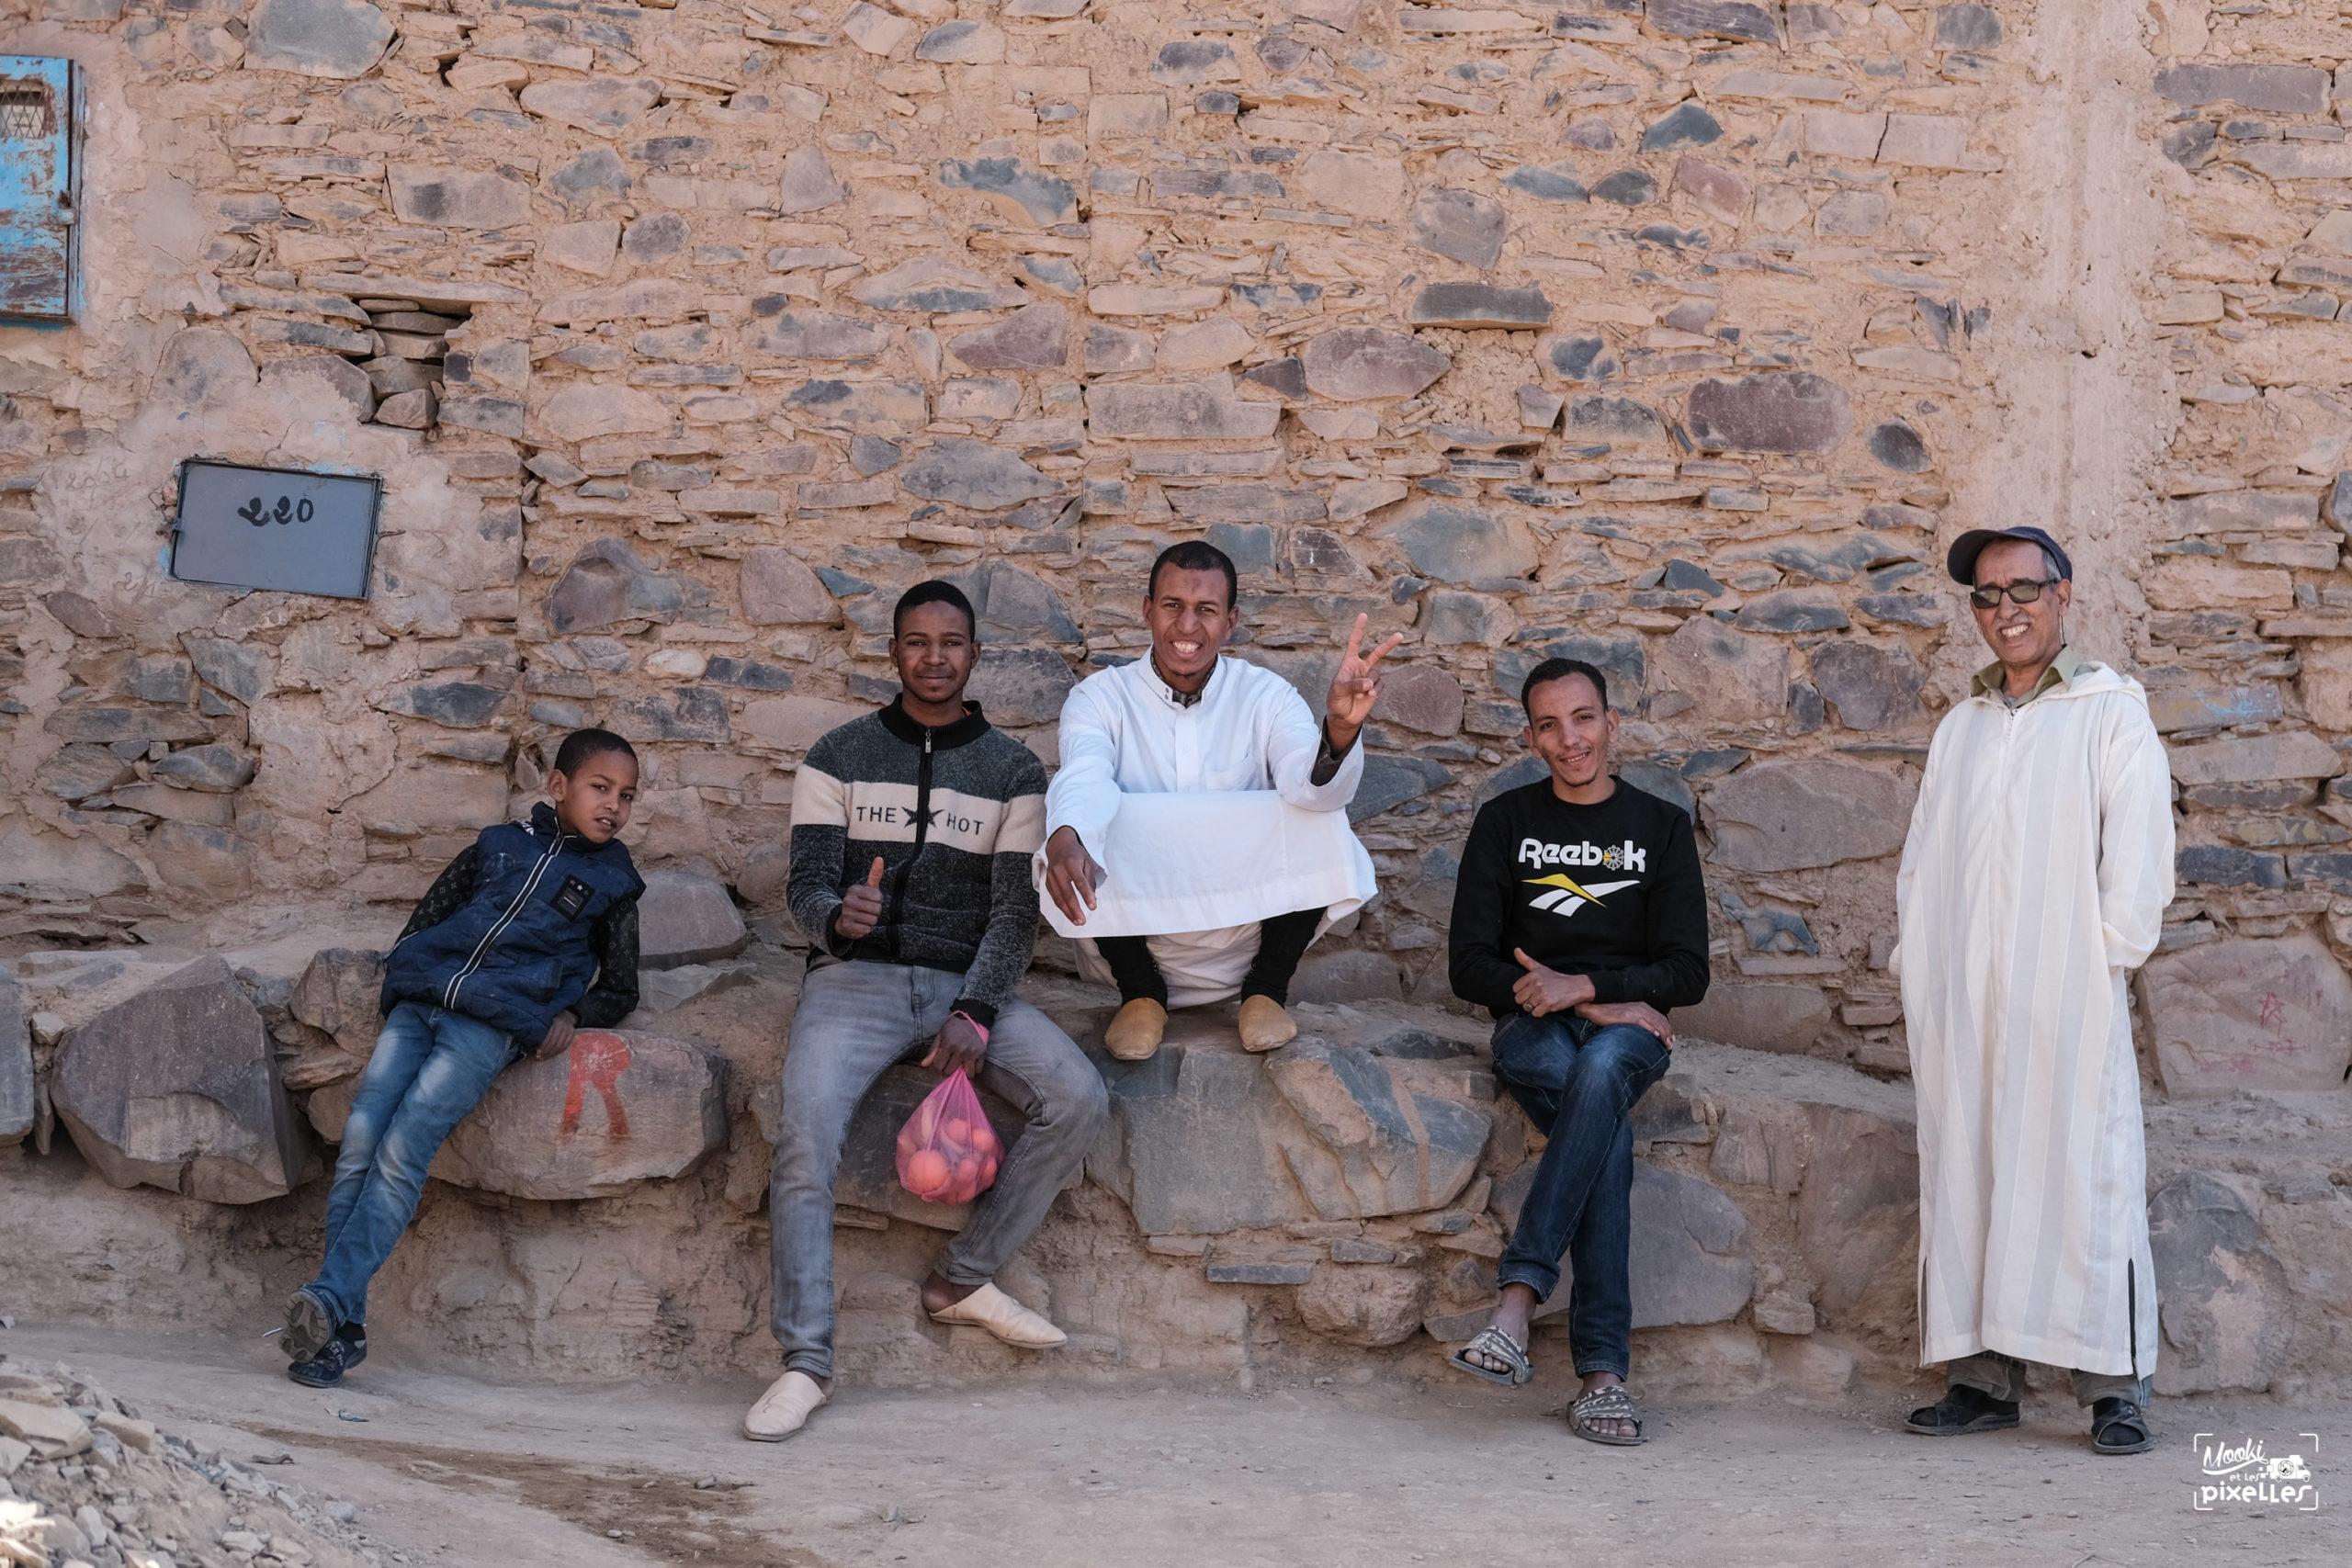 Groupe d'amis au Maroc